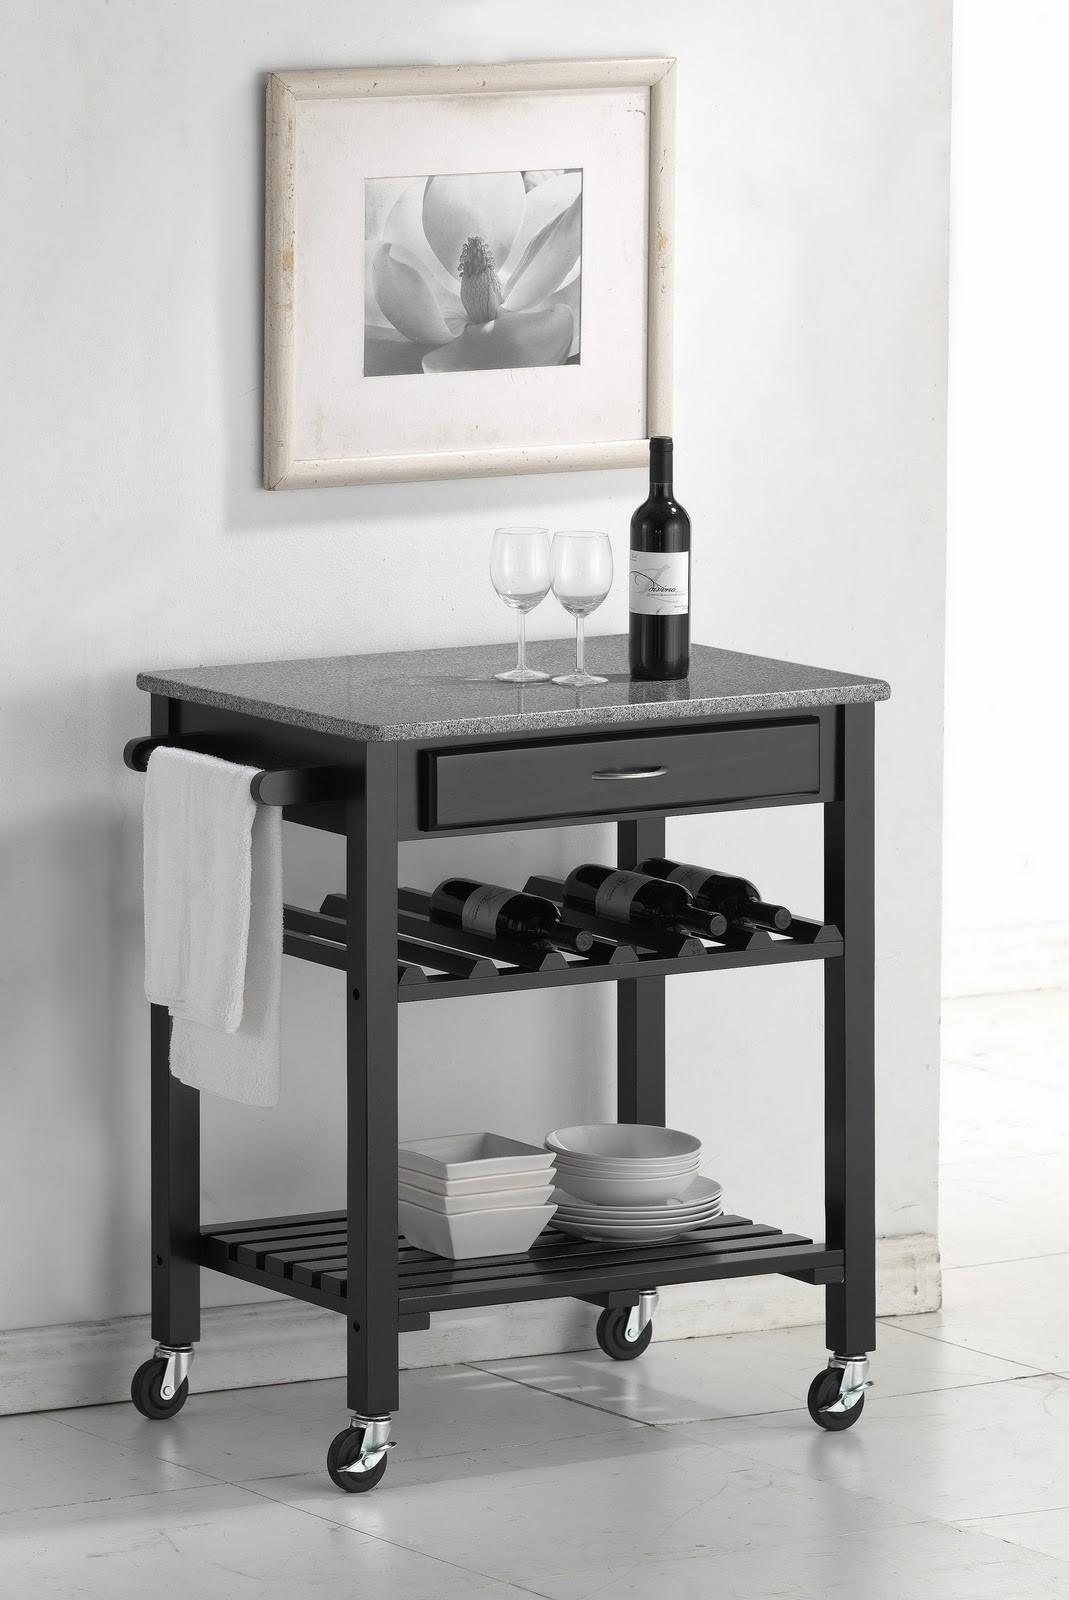 Pub Table With Wine Rack